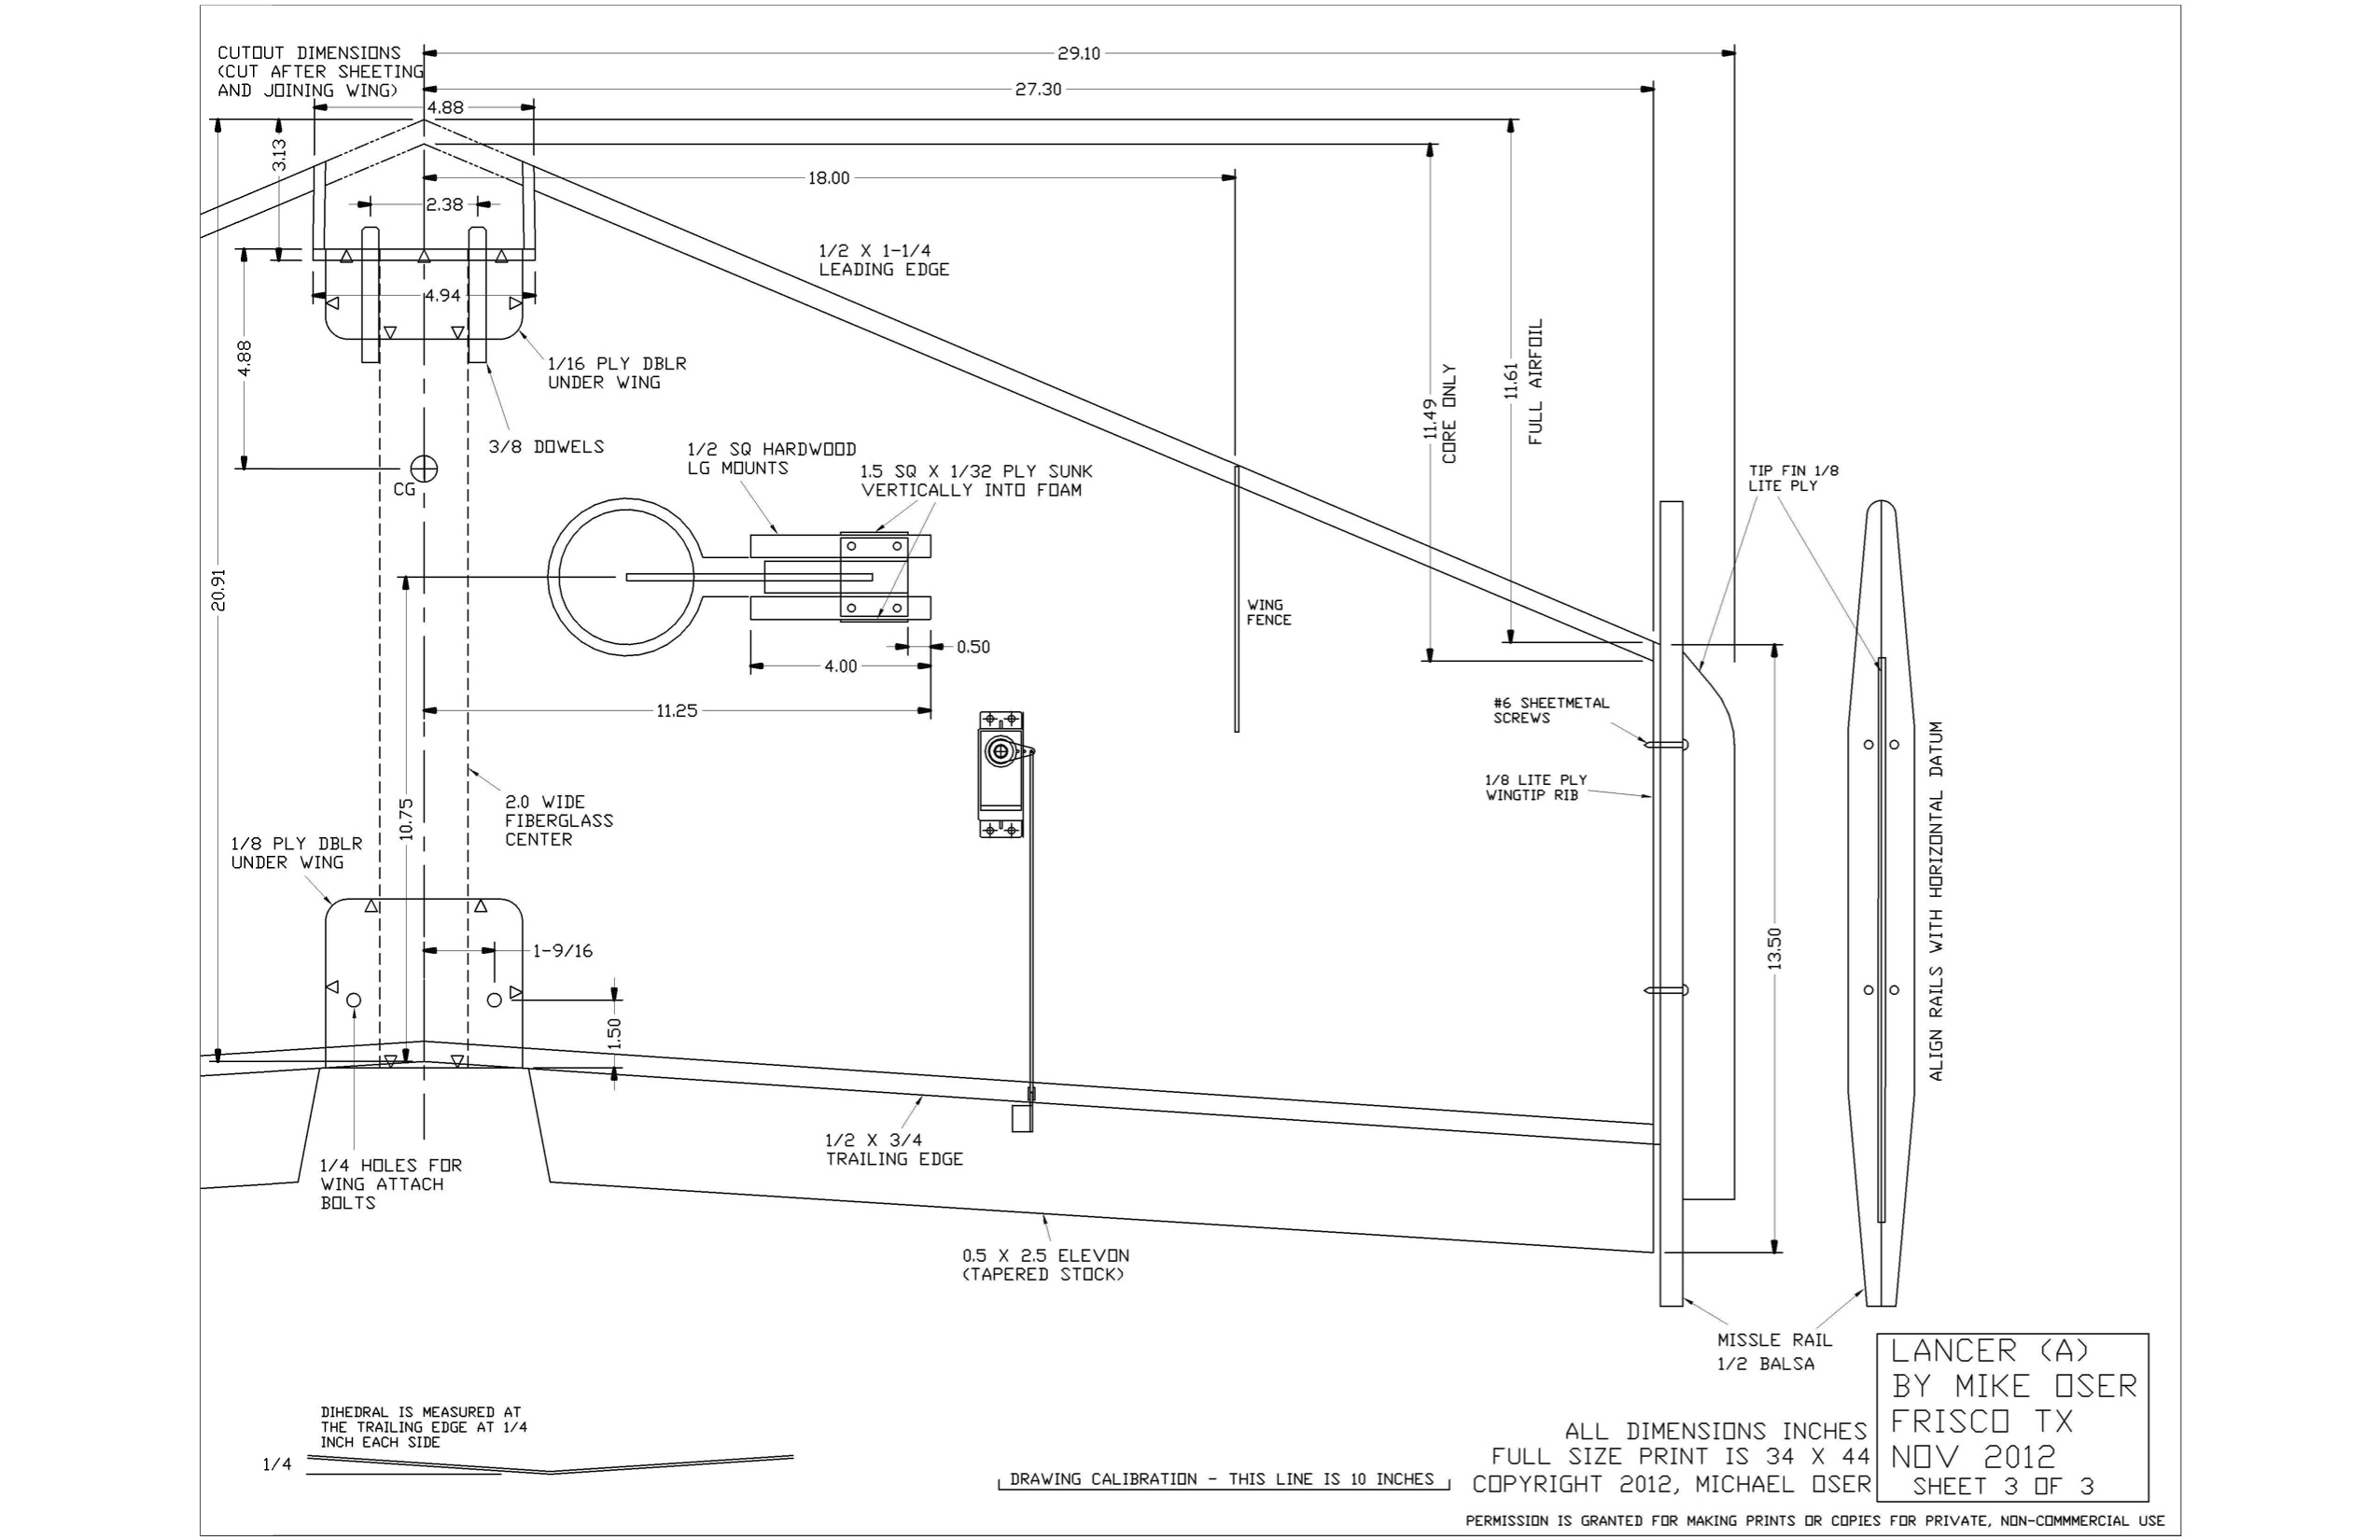 Click image for larger version  Name:Lancer Sht 3 (11x17).jpg Views:665 Size:418.8 KB ID:2064273